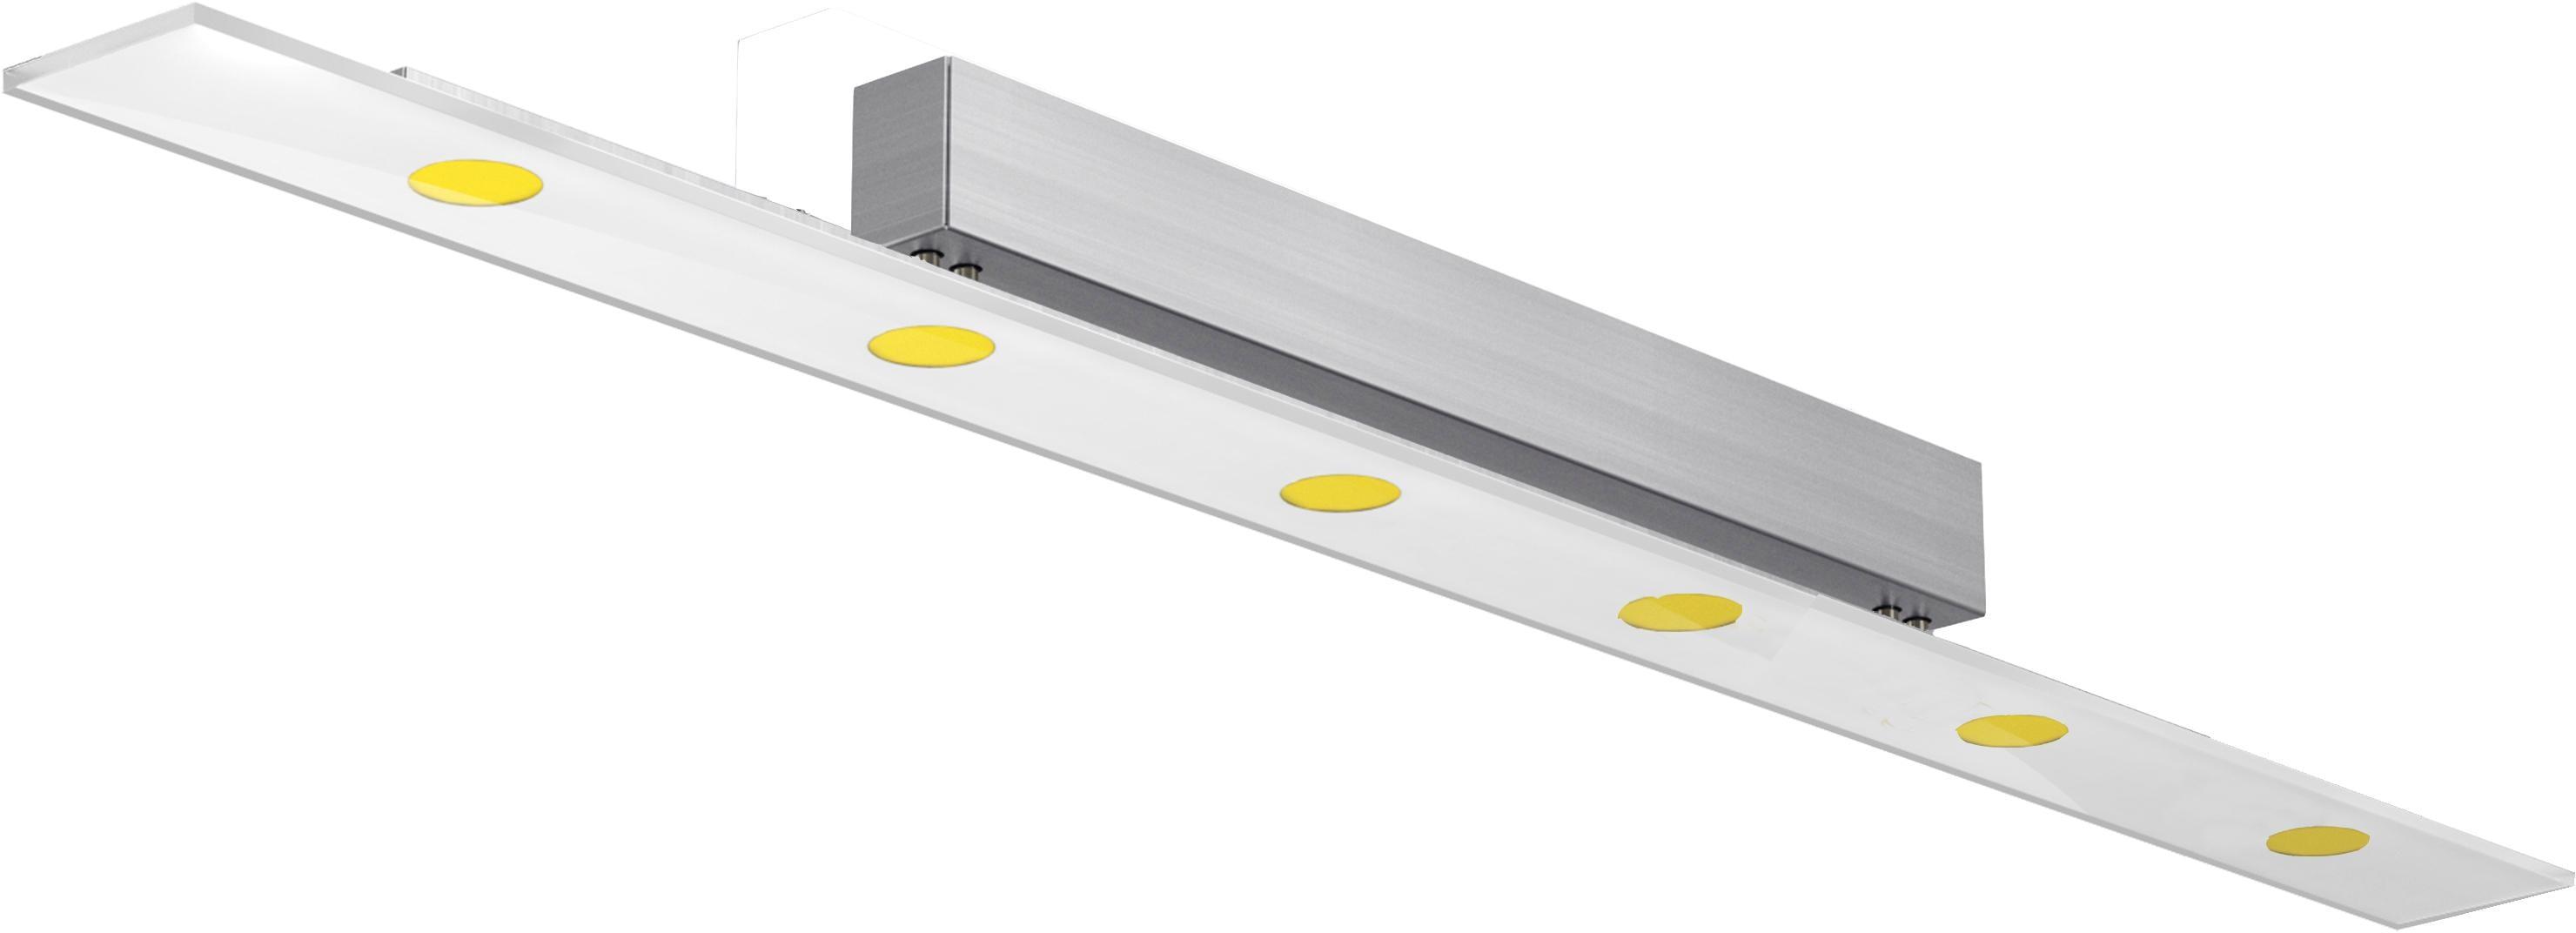 EVOTEC LED Deckenleuchte SUN LED, LED-Board, Warmweiß, LED Deckenlampe